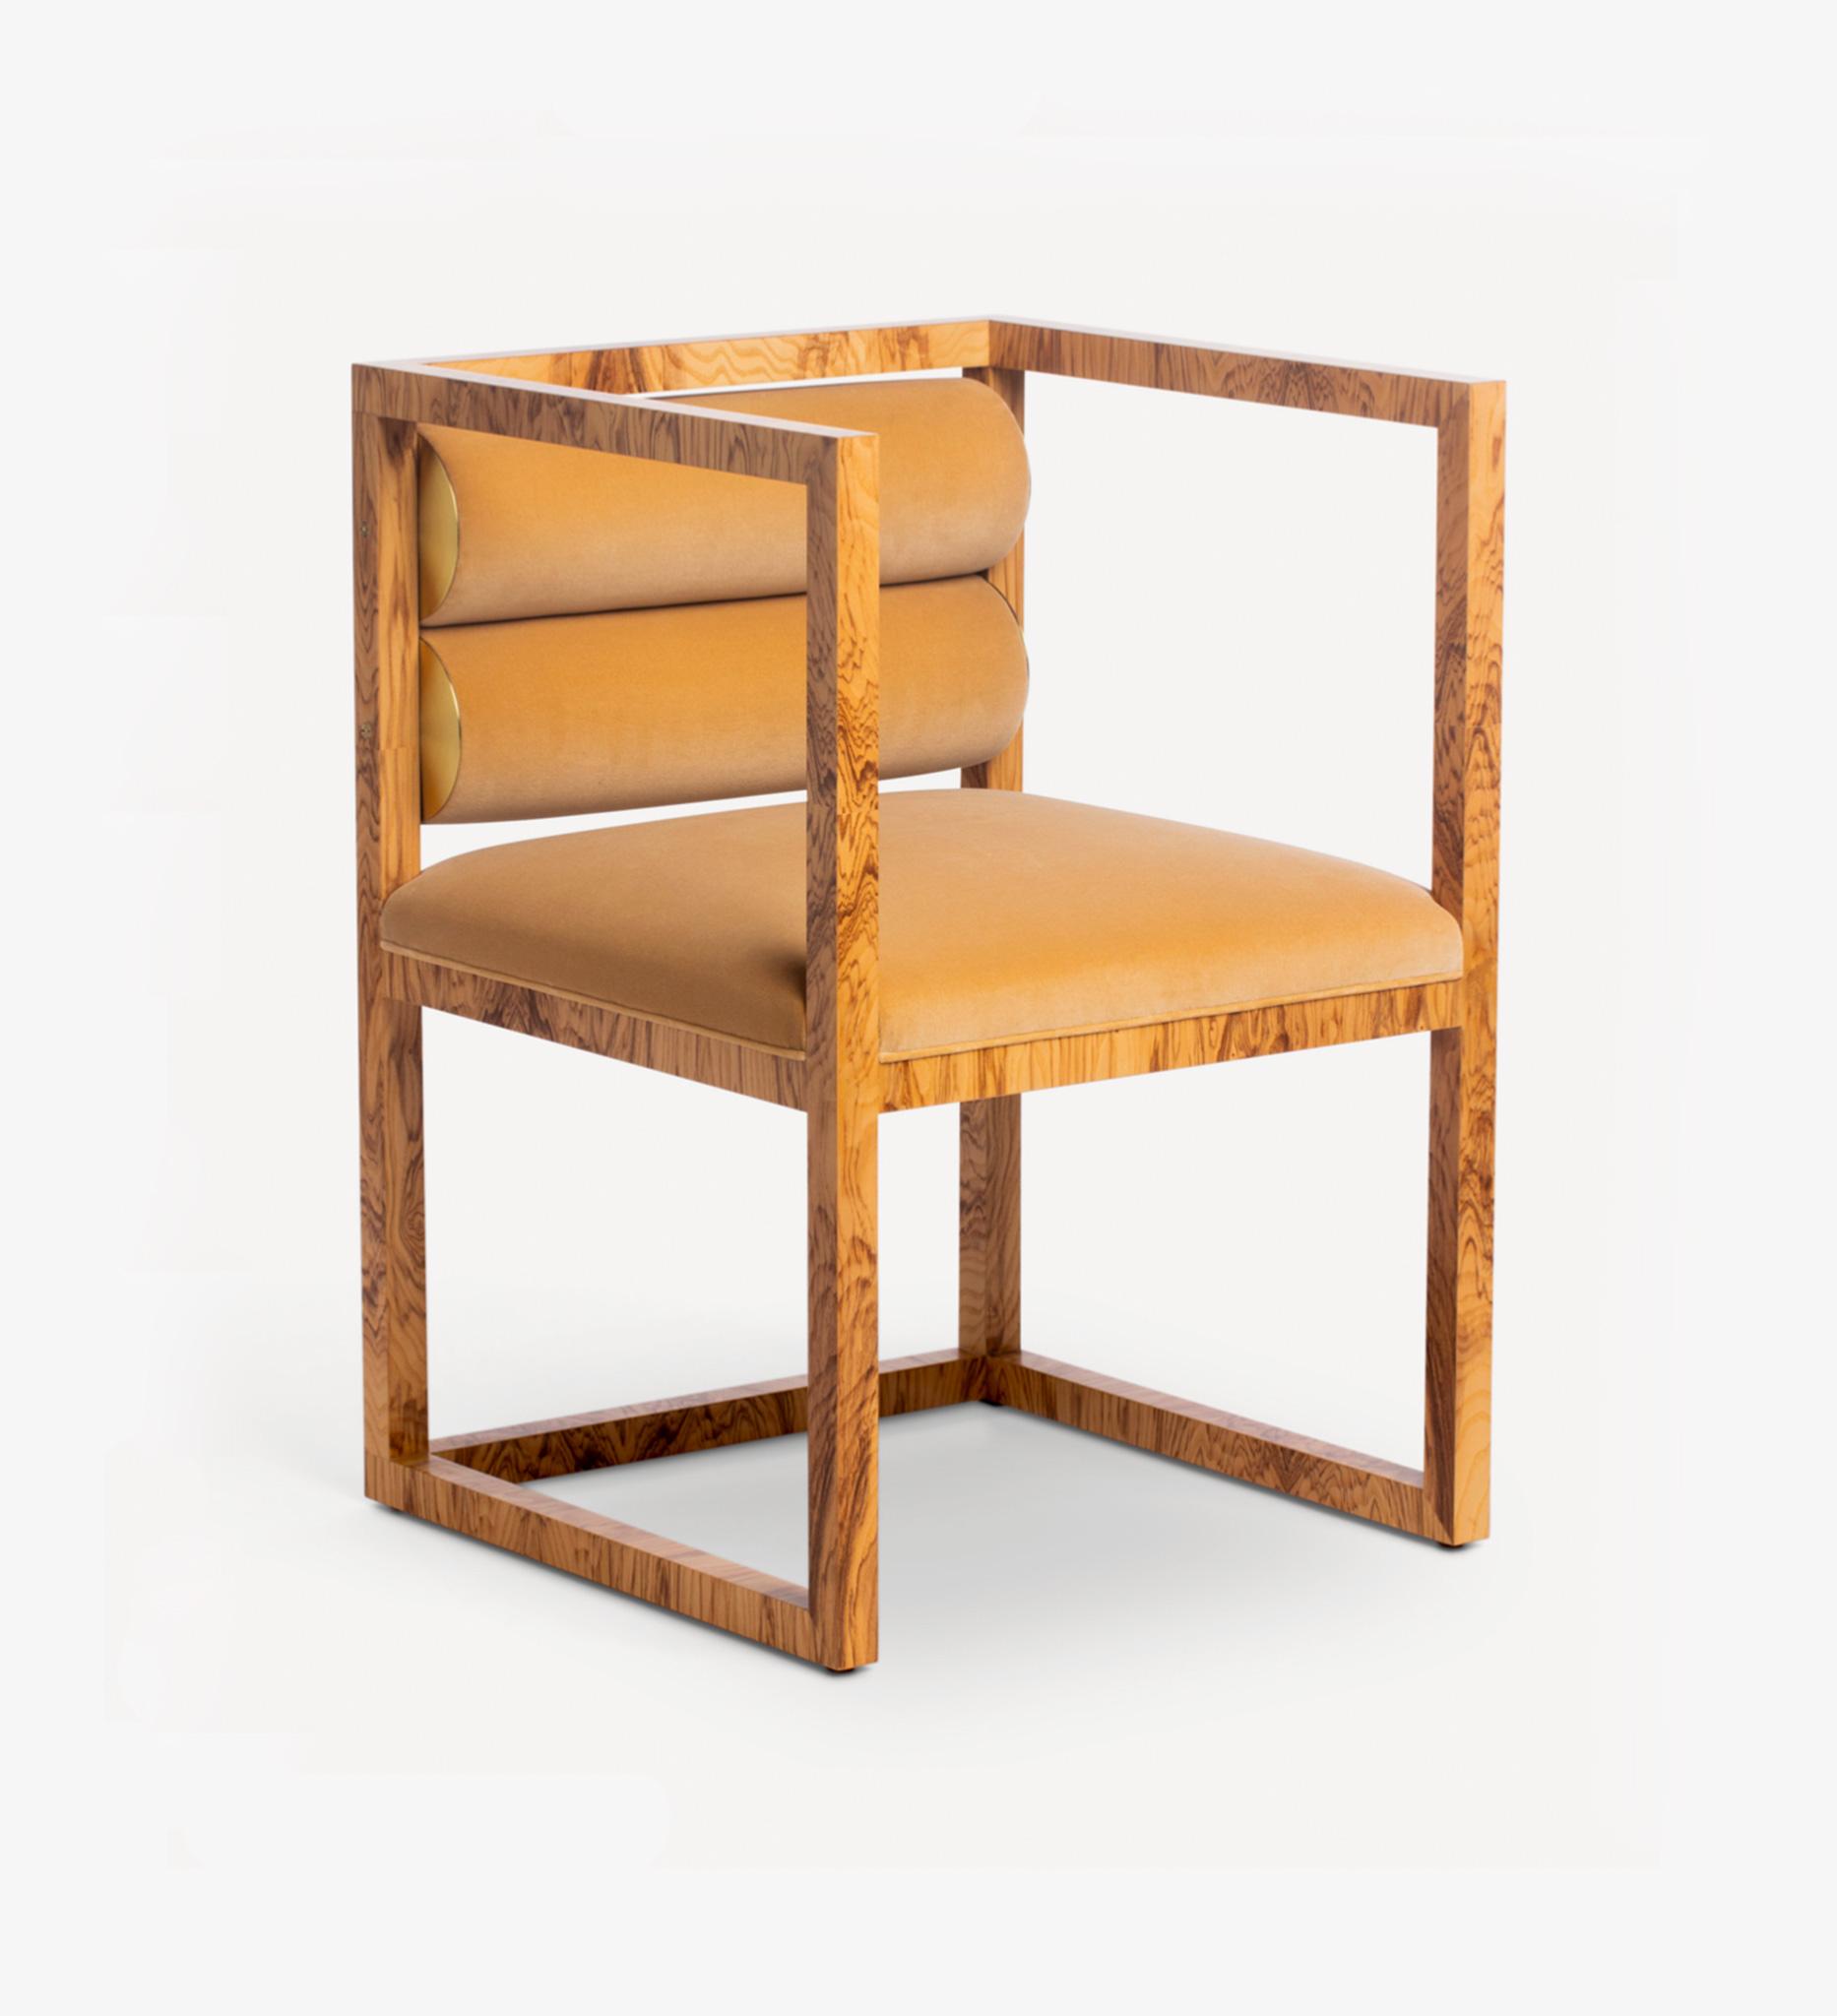 chair, wood, burl, brass, seating